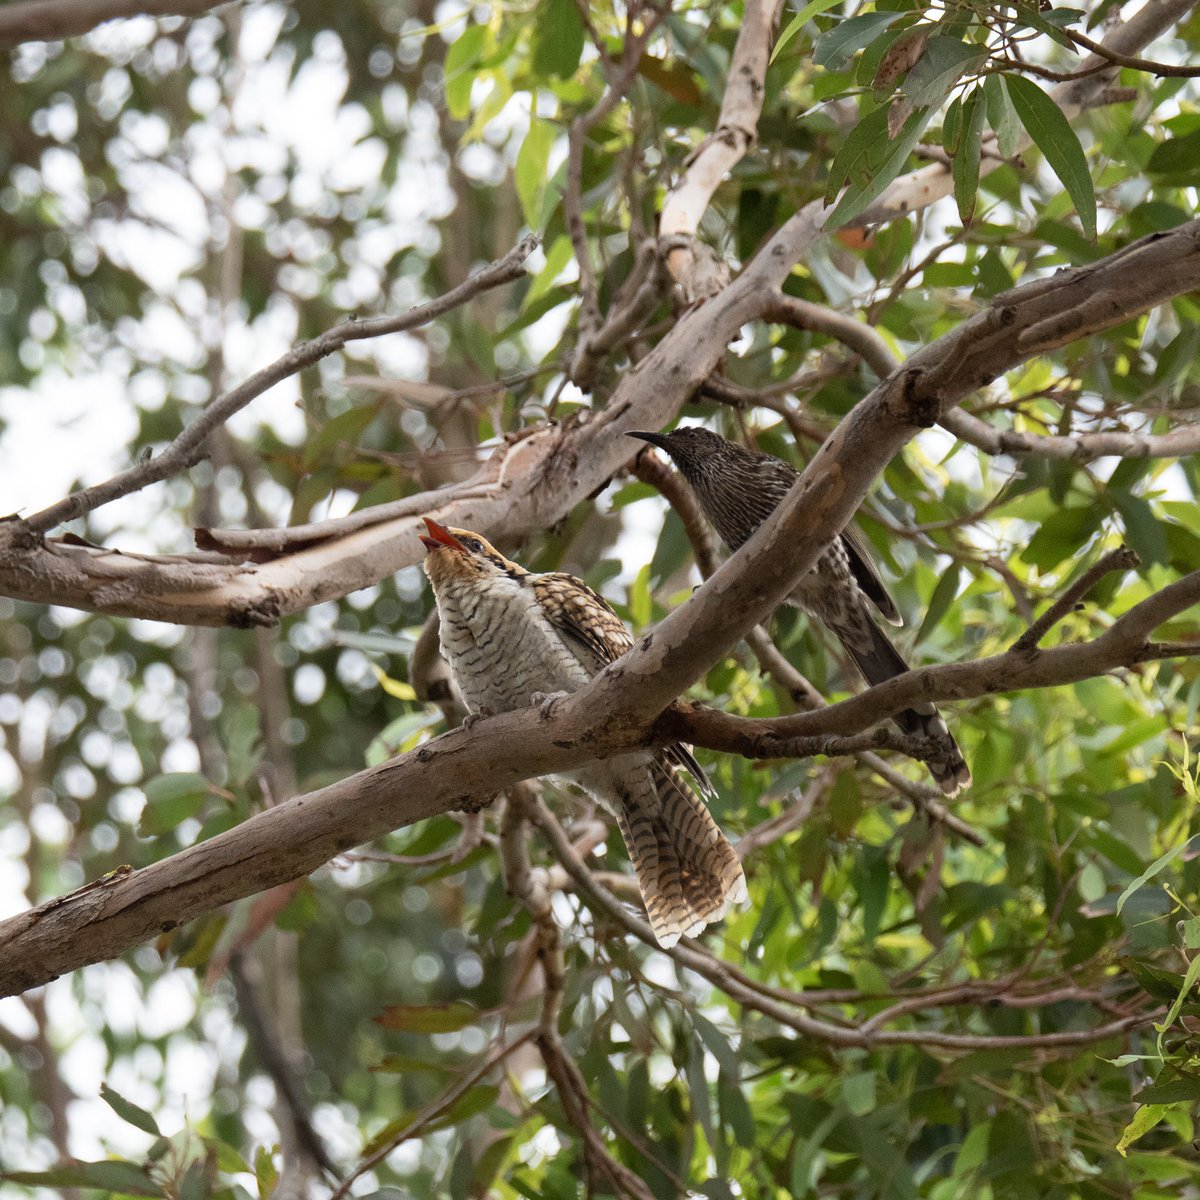 fab7e4b2c12f Eastern Koel is a type of brood parasitic Cuckoo